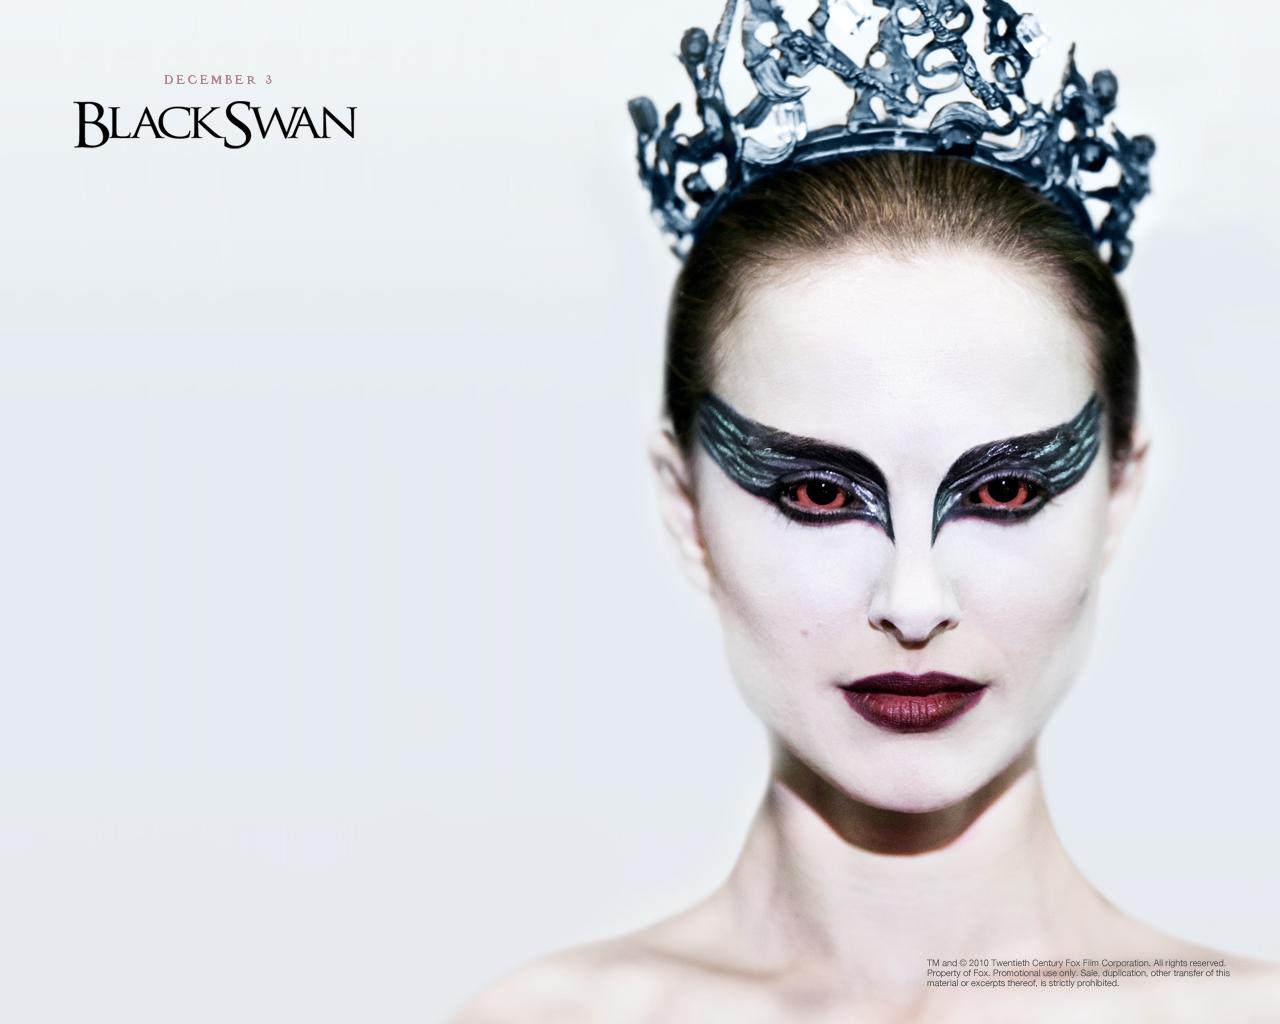 http://4.bp.blogspot.com/-aPWyAxo2kGo/TeUxqCSdMjI/AAAAAAAAAZU/056aSqsrGW8/s1600/Natalie_Portman_in_Black_Swan_Wallpaper_1_1024.jpg